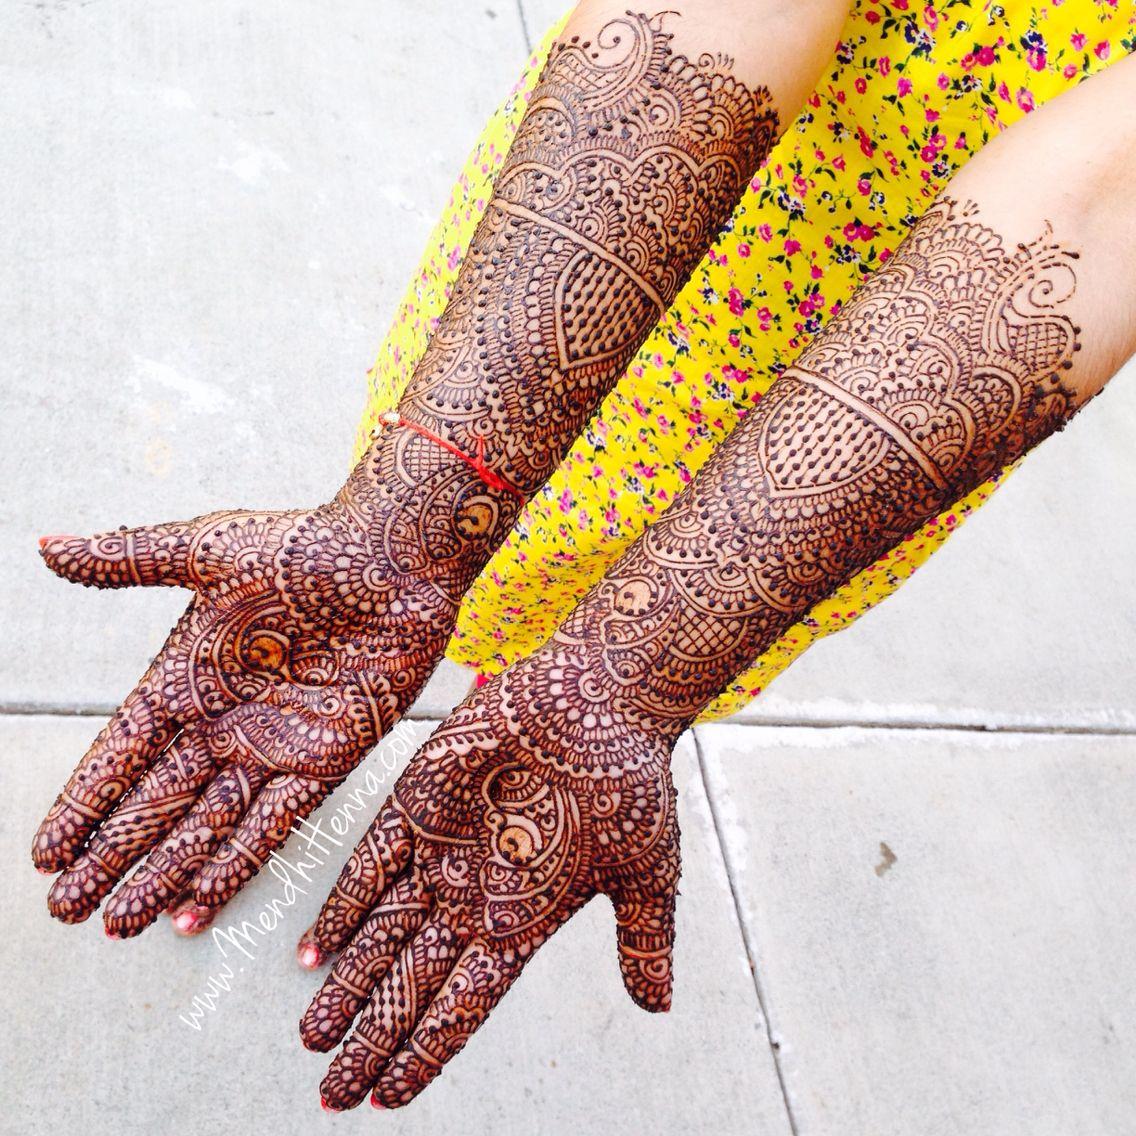 Attractive dulhan henna mehndi design for full hand - Indian Bridal Henna Or Mehndi Designs Hand Mehendi Bridal Fashion